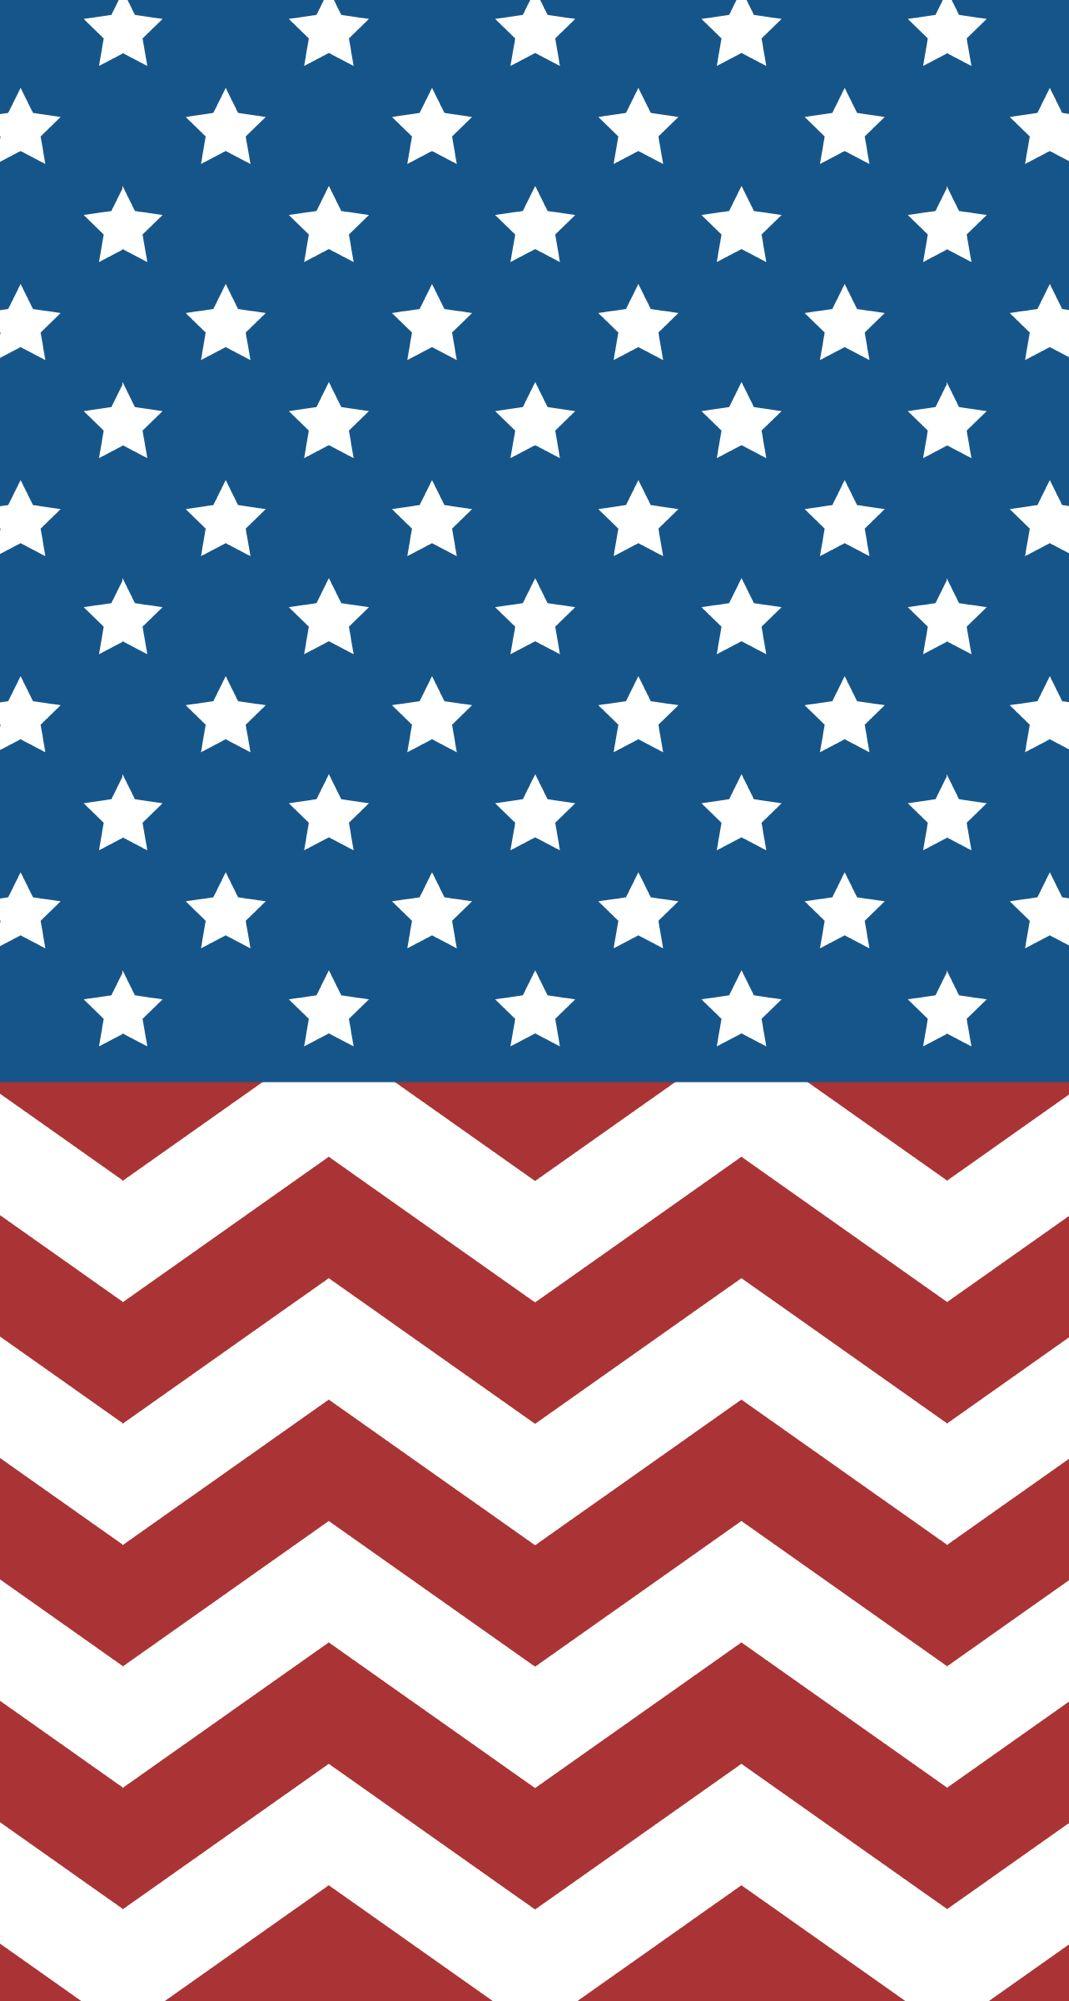 American flag/chevron iPhone wallpaper Pinterest